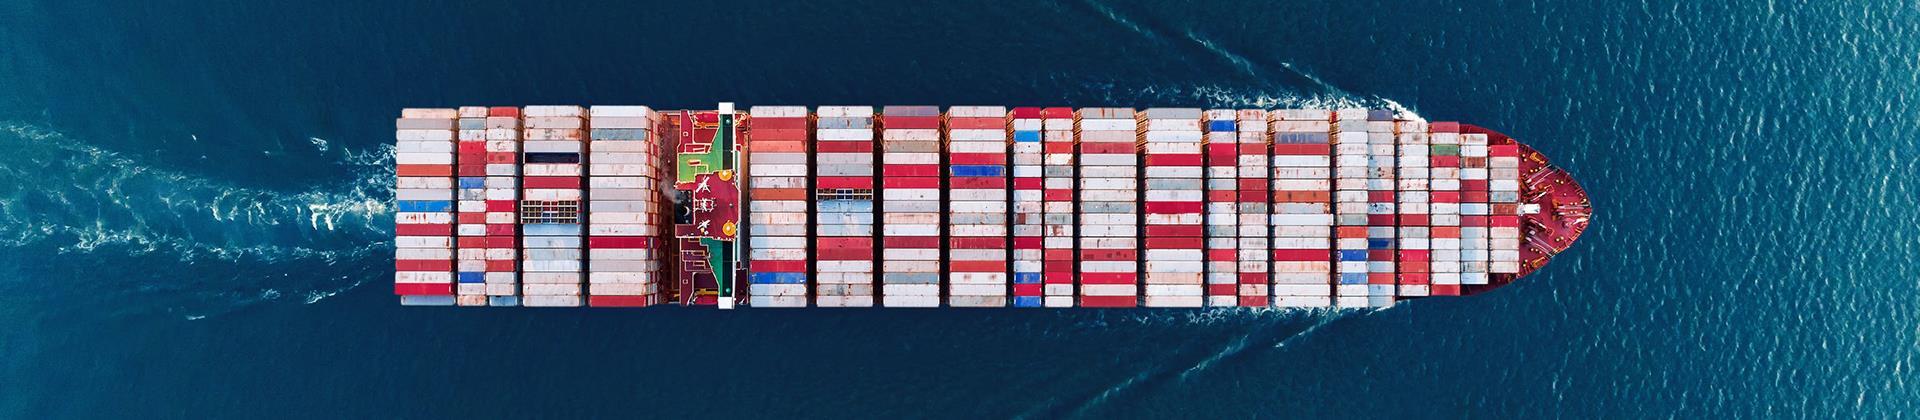 wartsila-seals-and-bearings-merchant-vessel-aerial